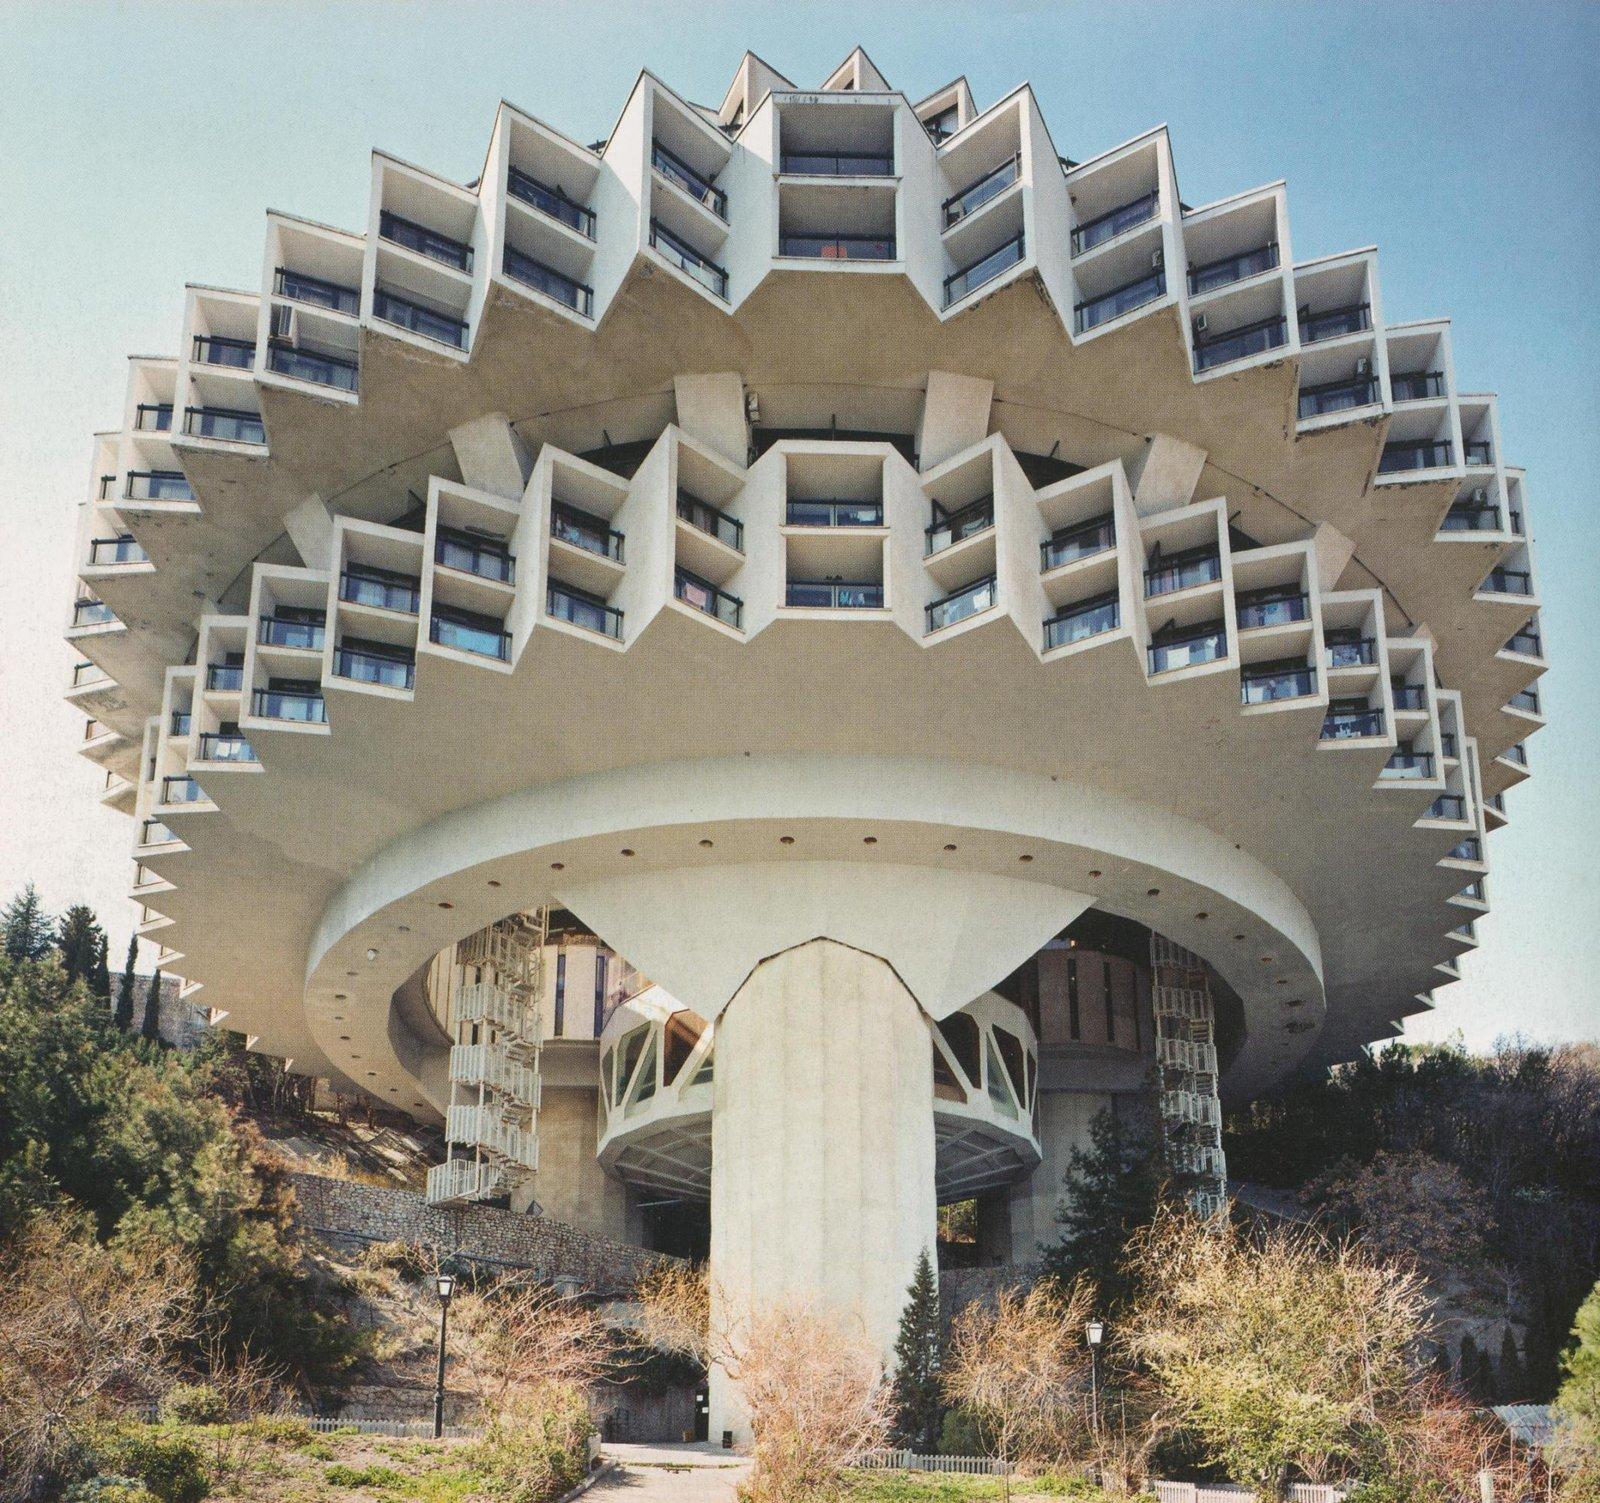 Holiday center, Hal Yalta, 1984